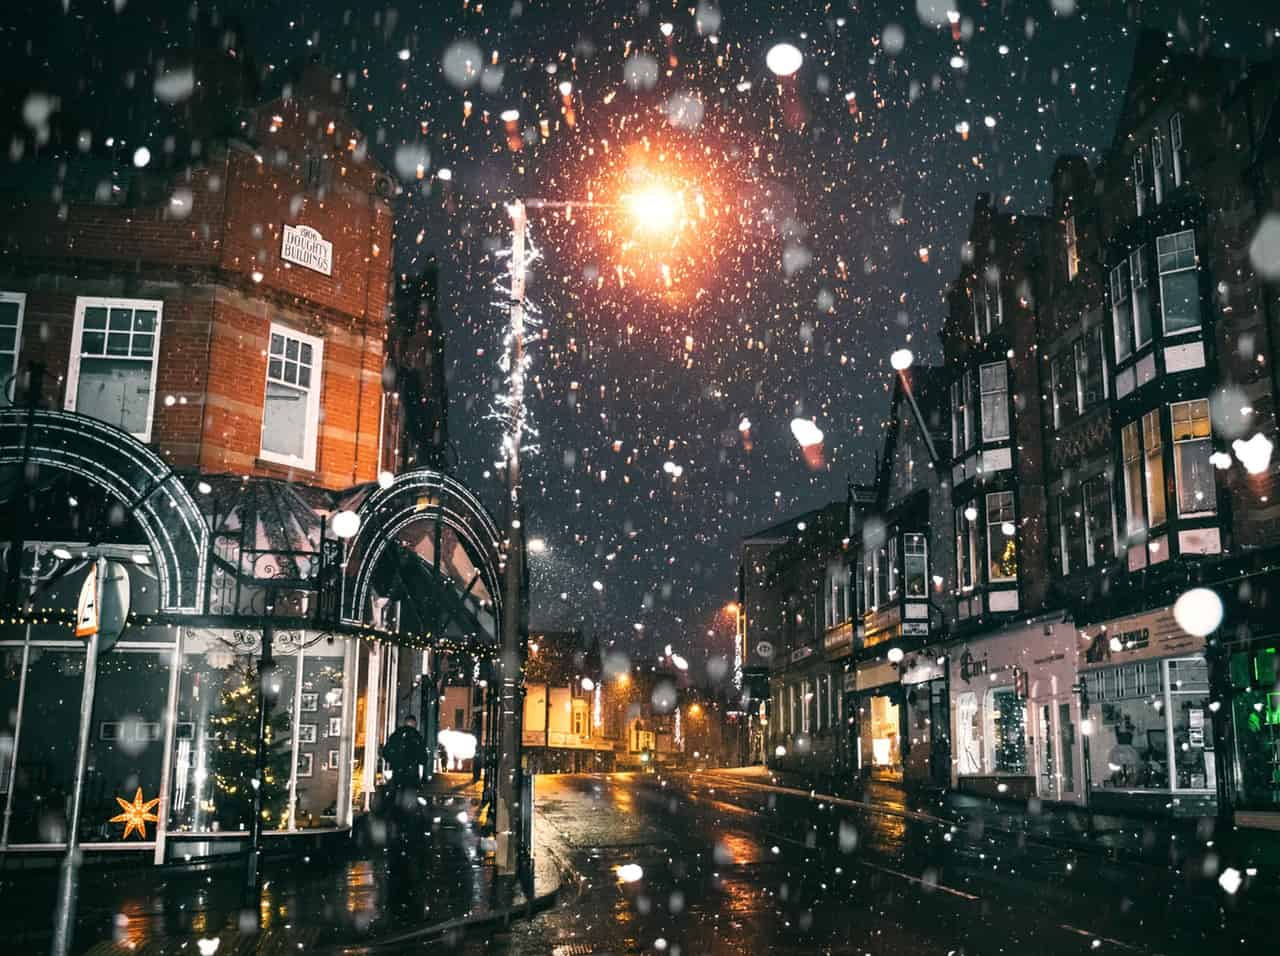 How real estate investors can prepare for winter